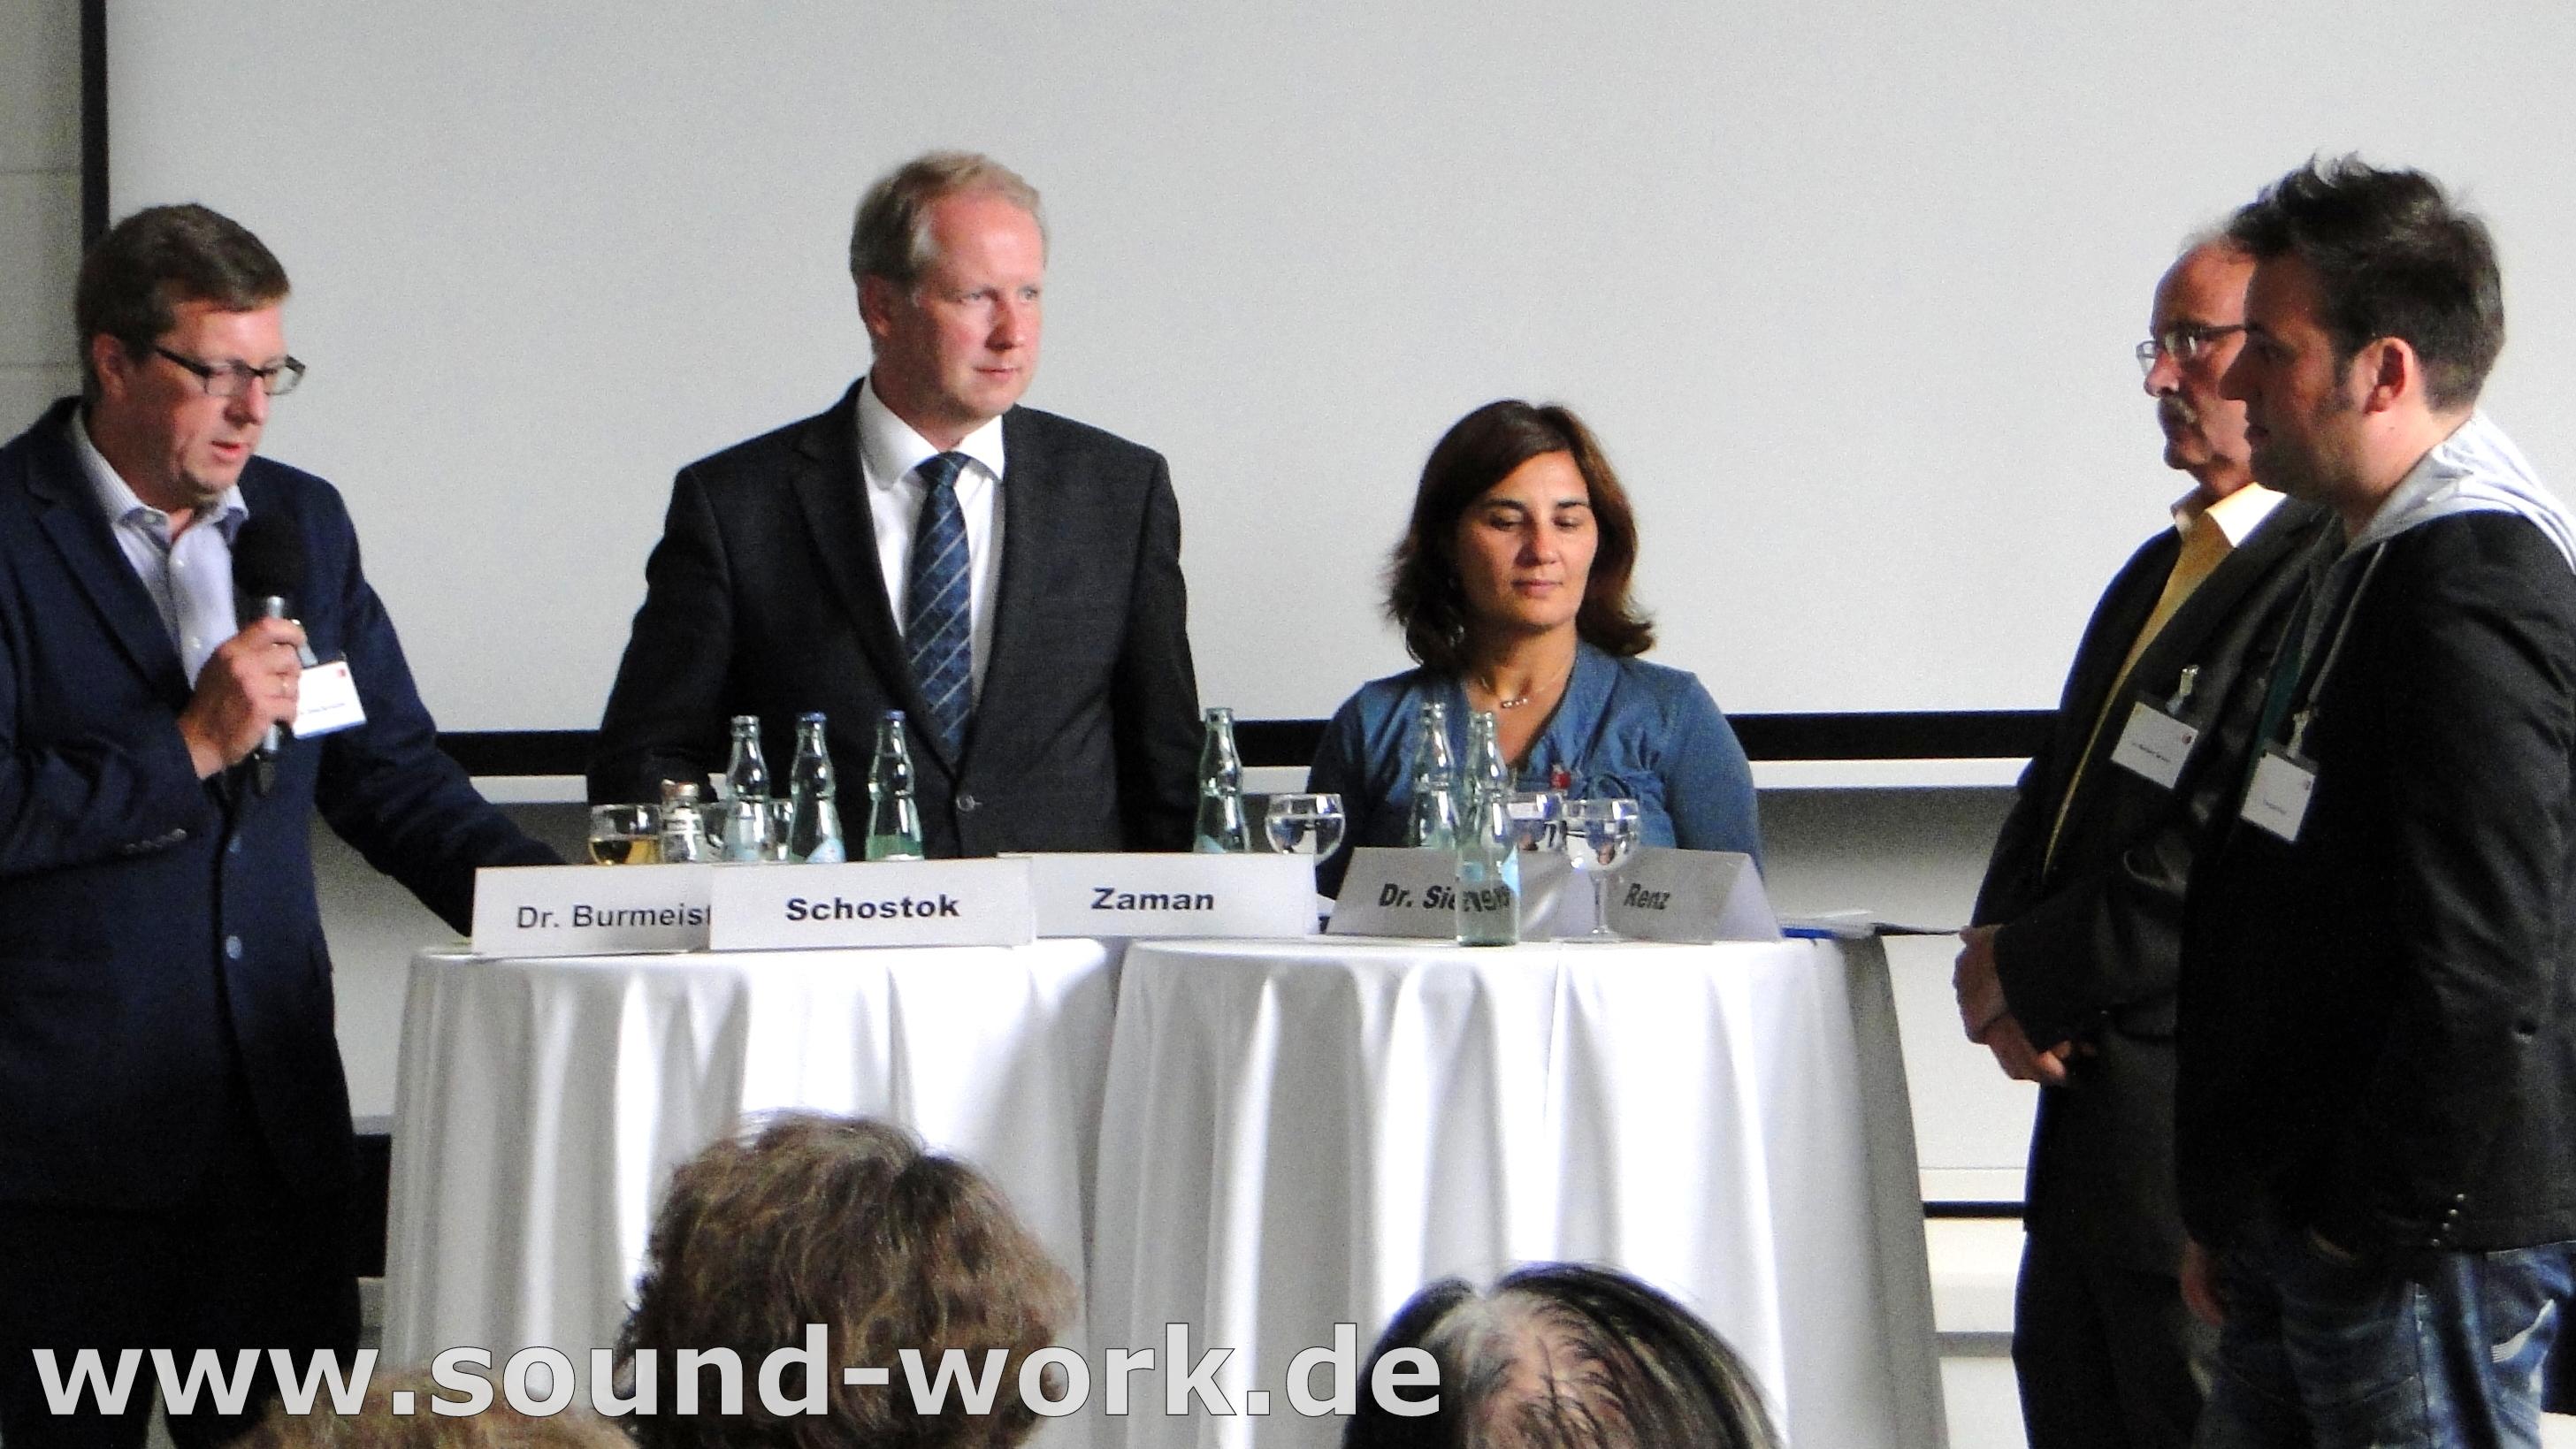 Podiumsdiskussion -Thema Kulturelle Teilhabe